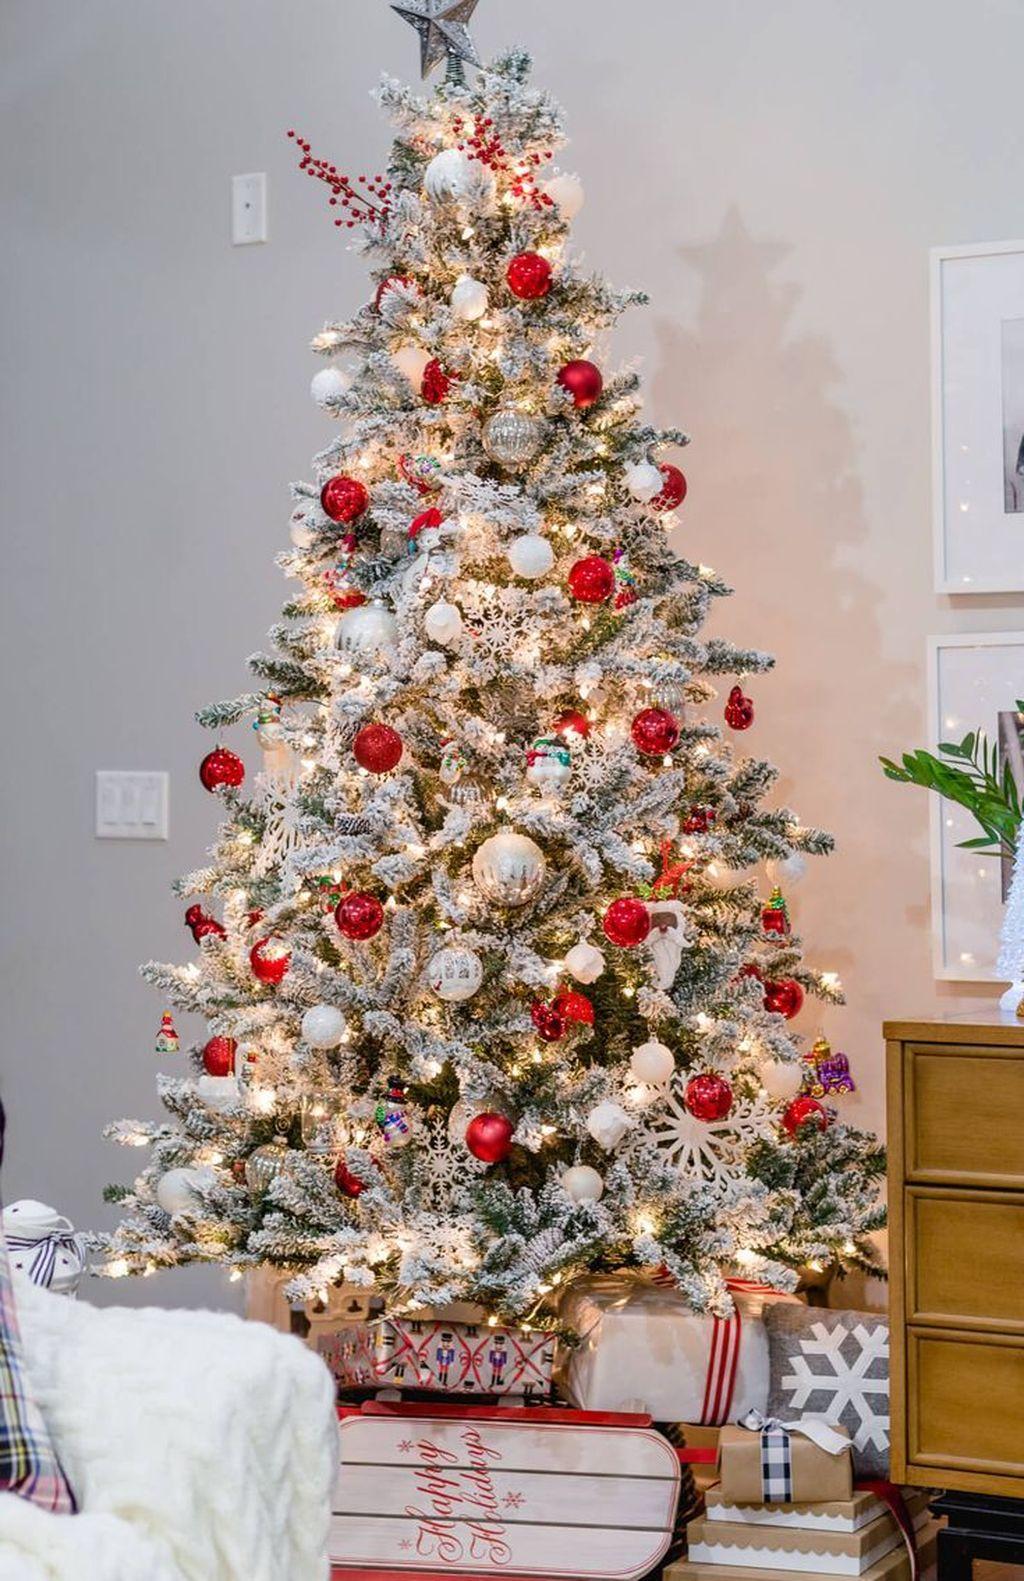 Amazing Winter Christmas Tree Design And Decor Ideas 08